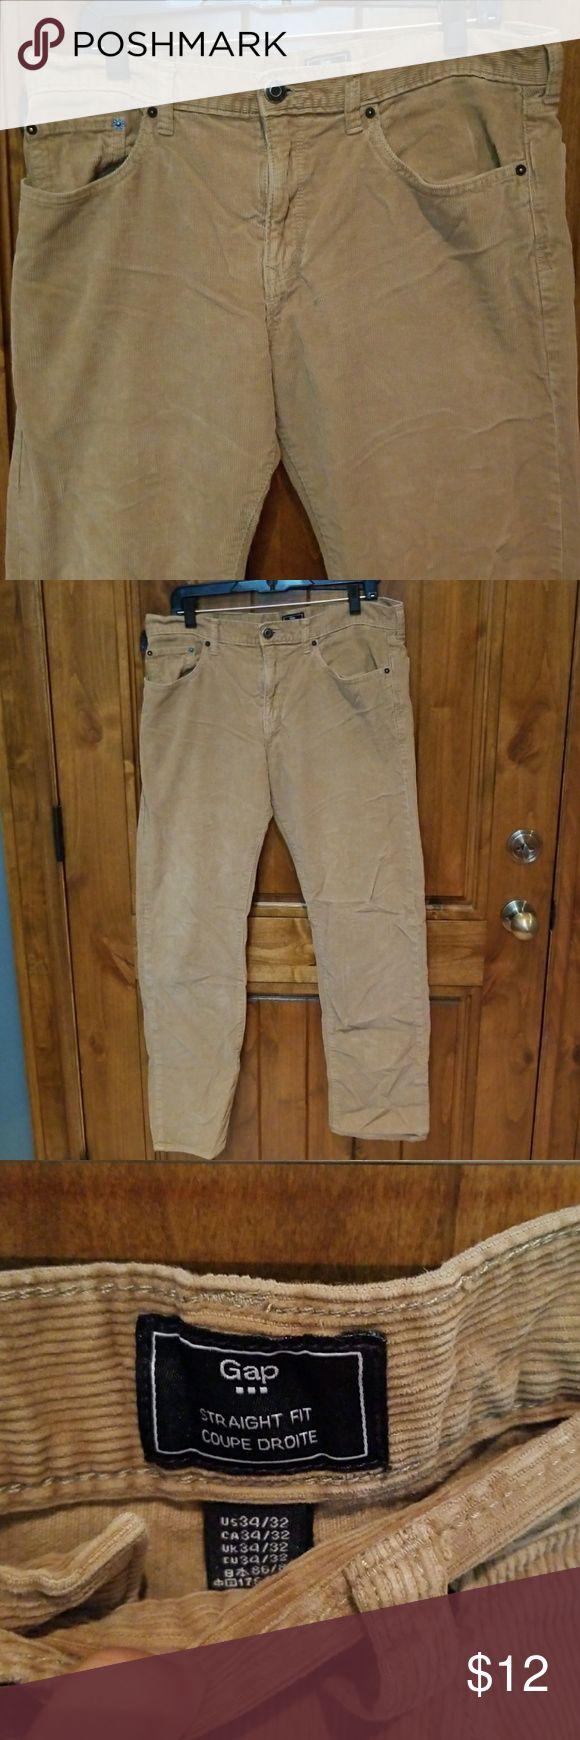 Gap mens corduroy pants Size 34x32 Very good condition GAP Pants Corduroy